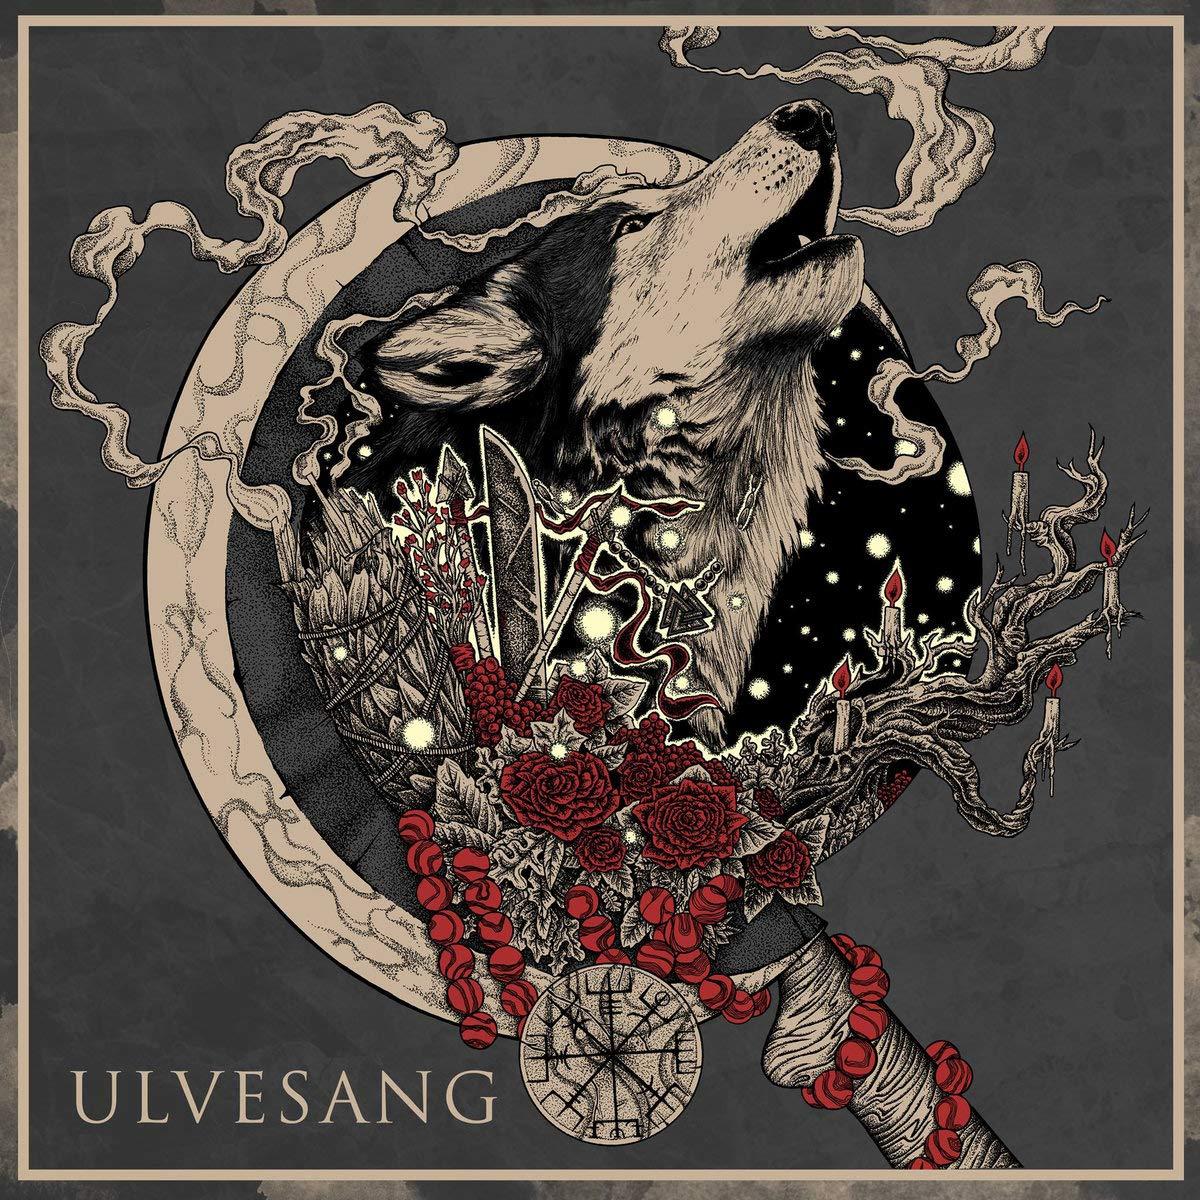 Ulvesang [12 inch Analog]                                                                                                                                                                                                                                                    <span class=